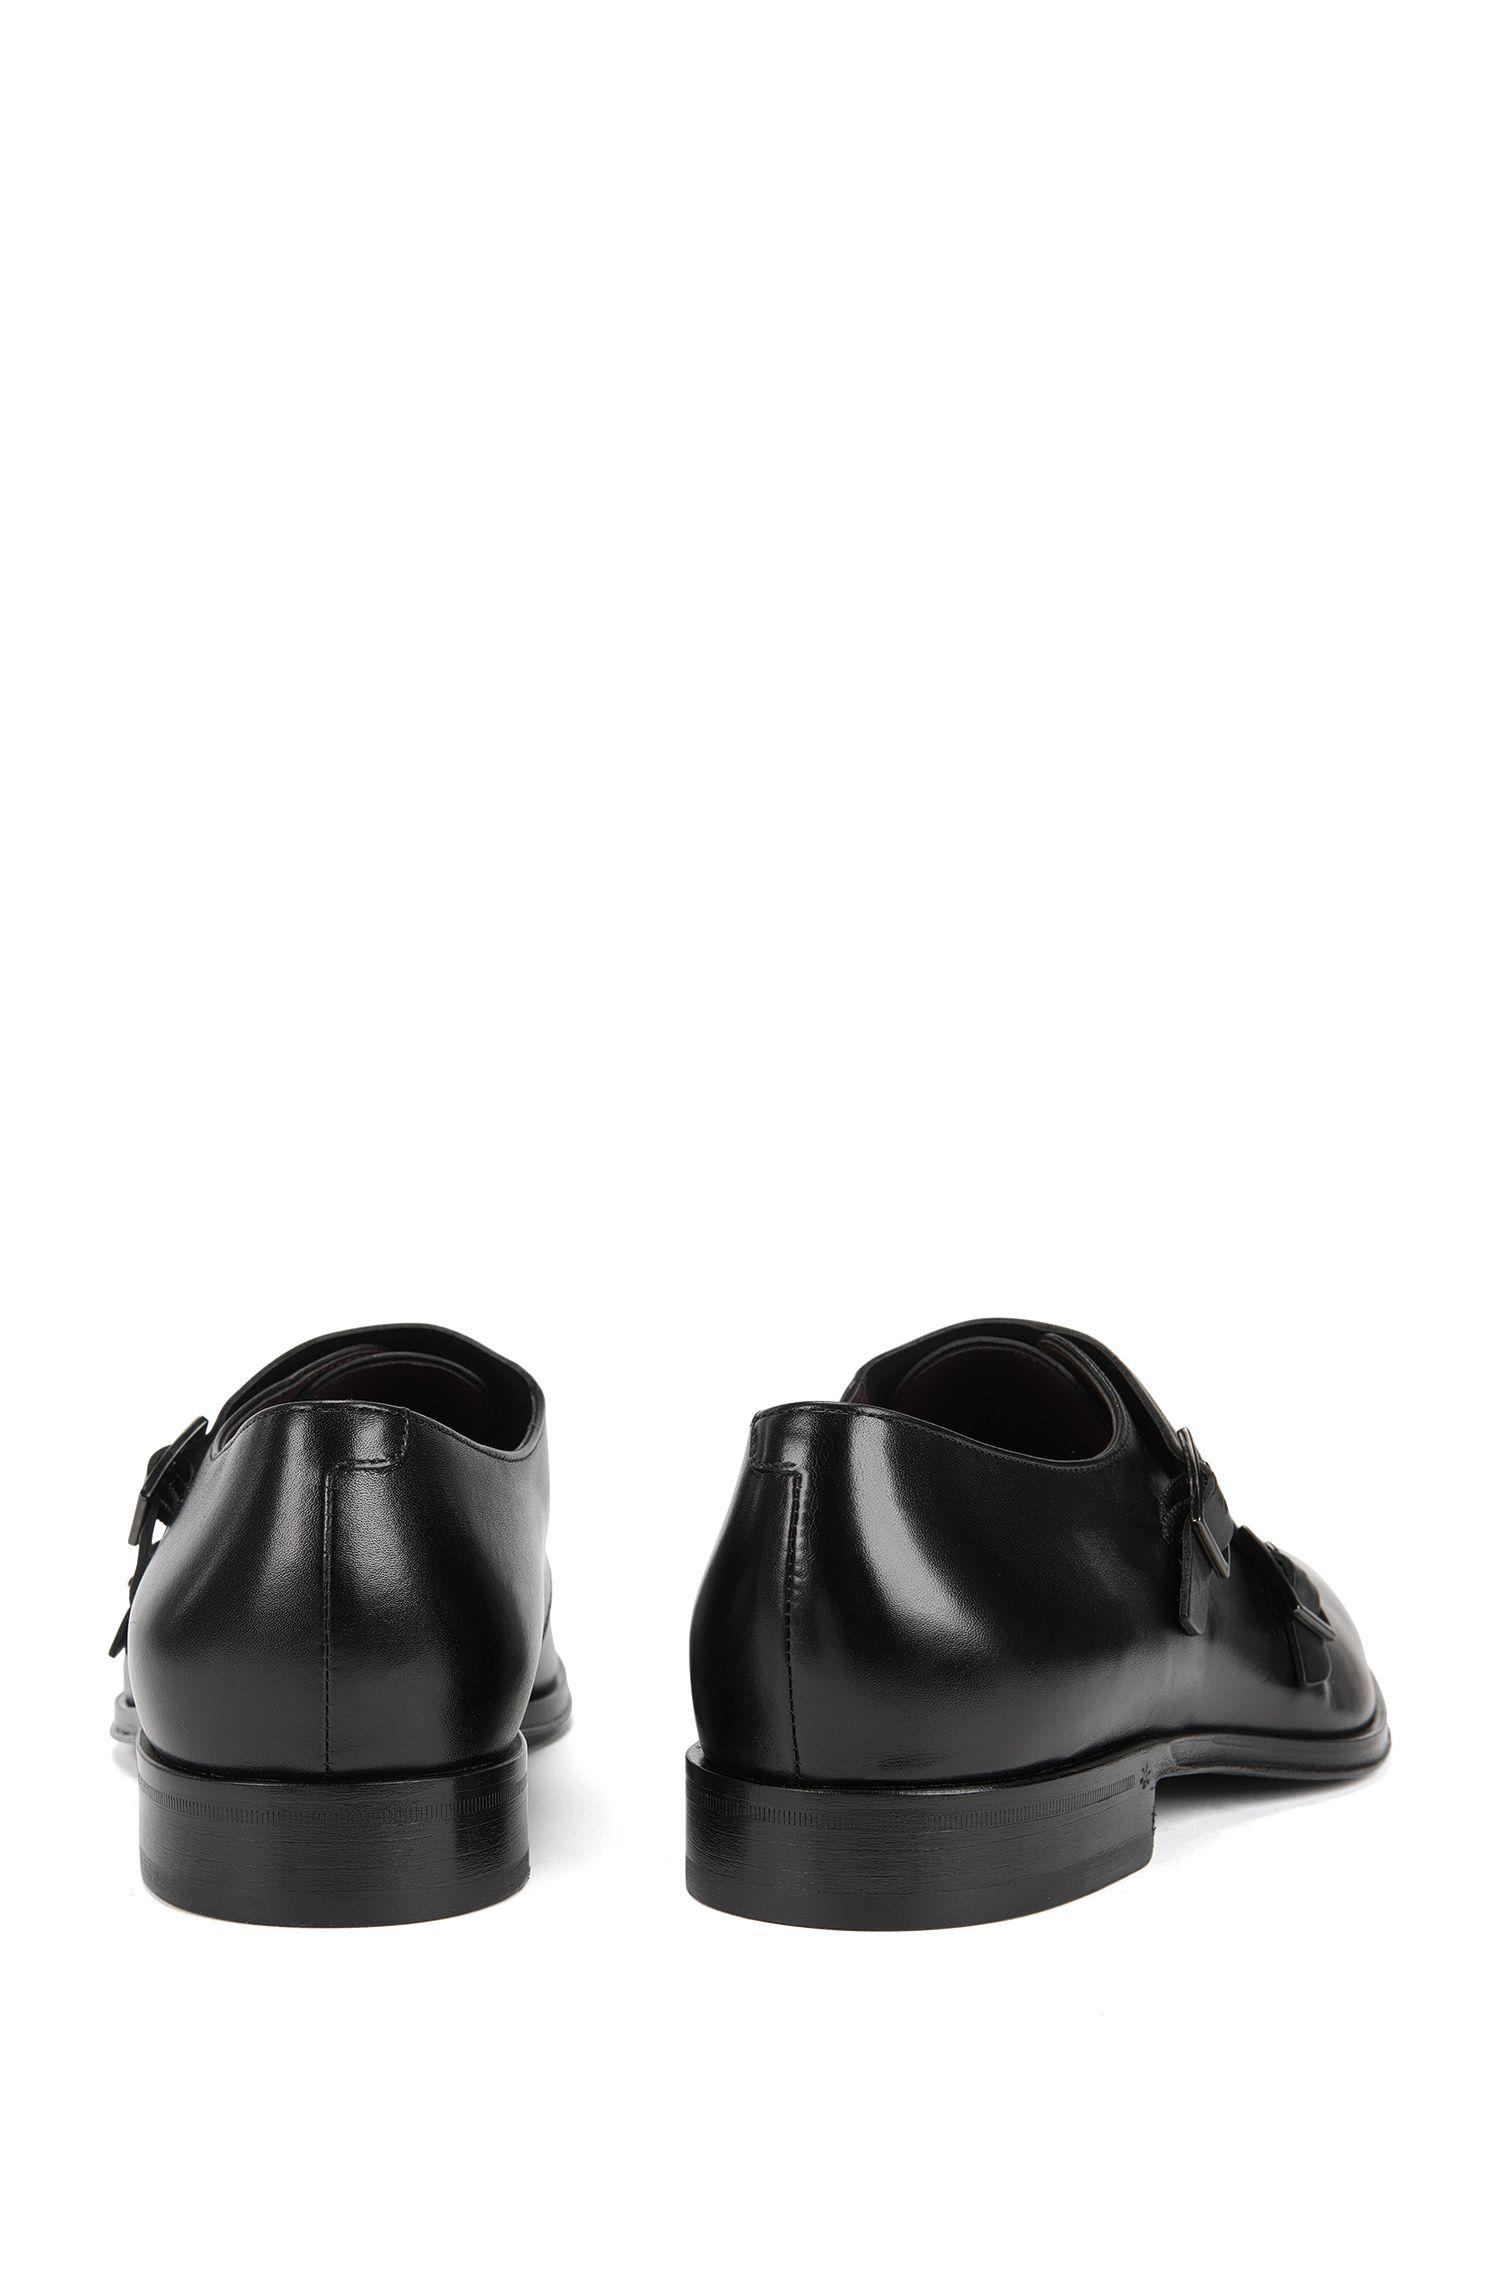 Doppelte Monkstraps aus genarbtem Leder